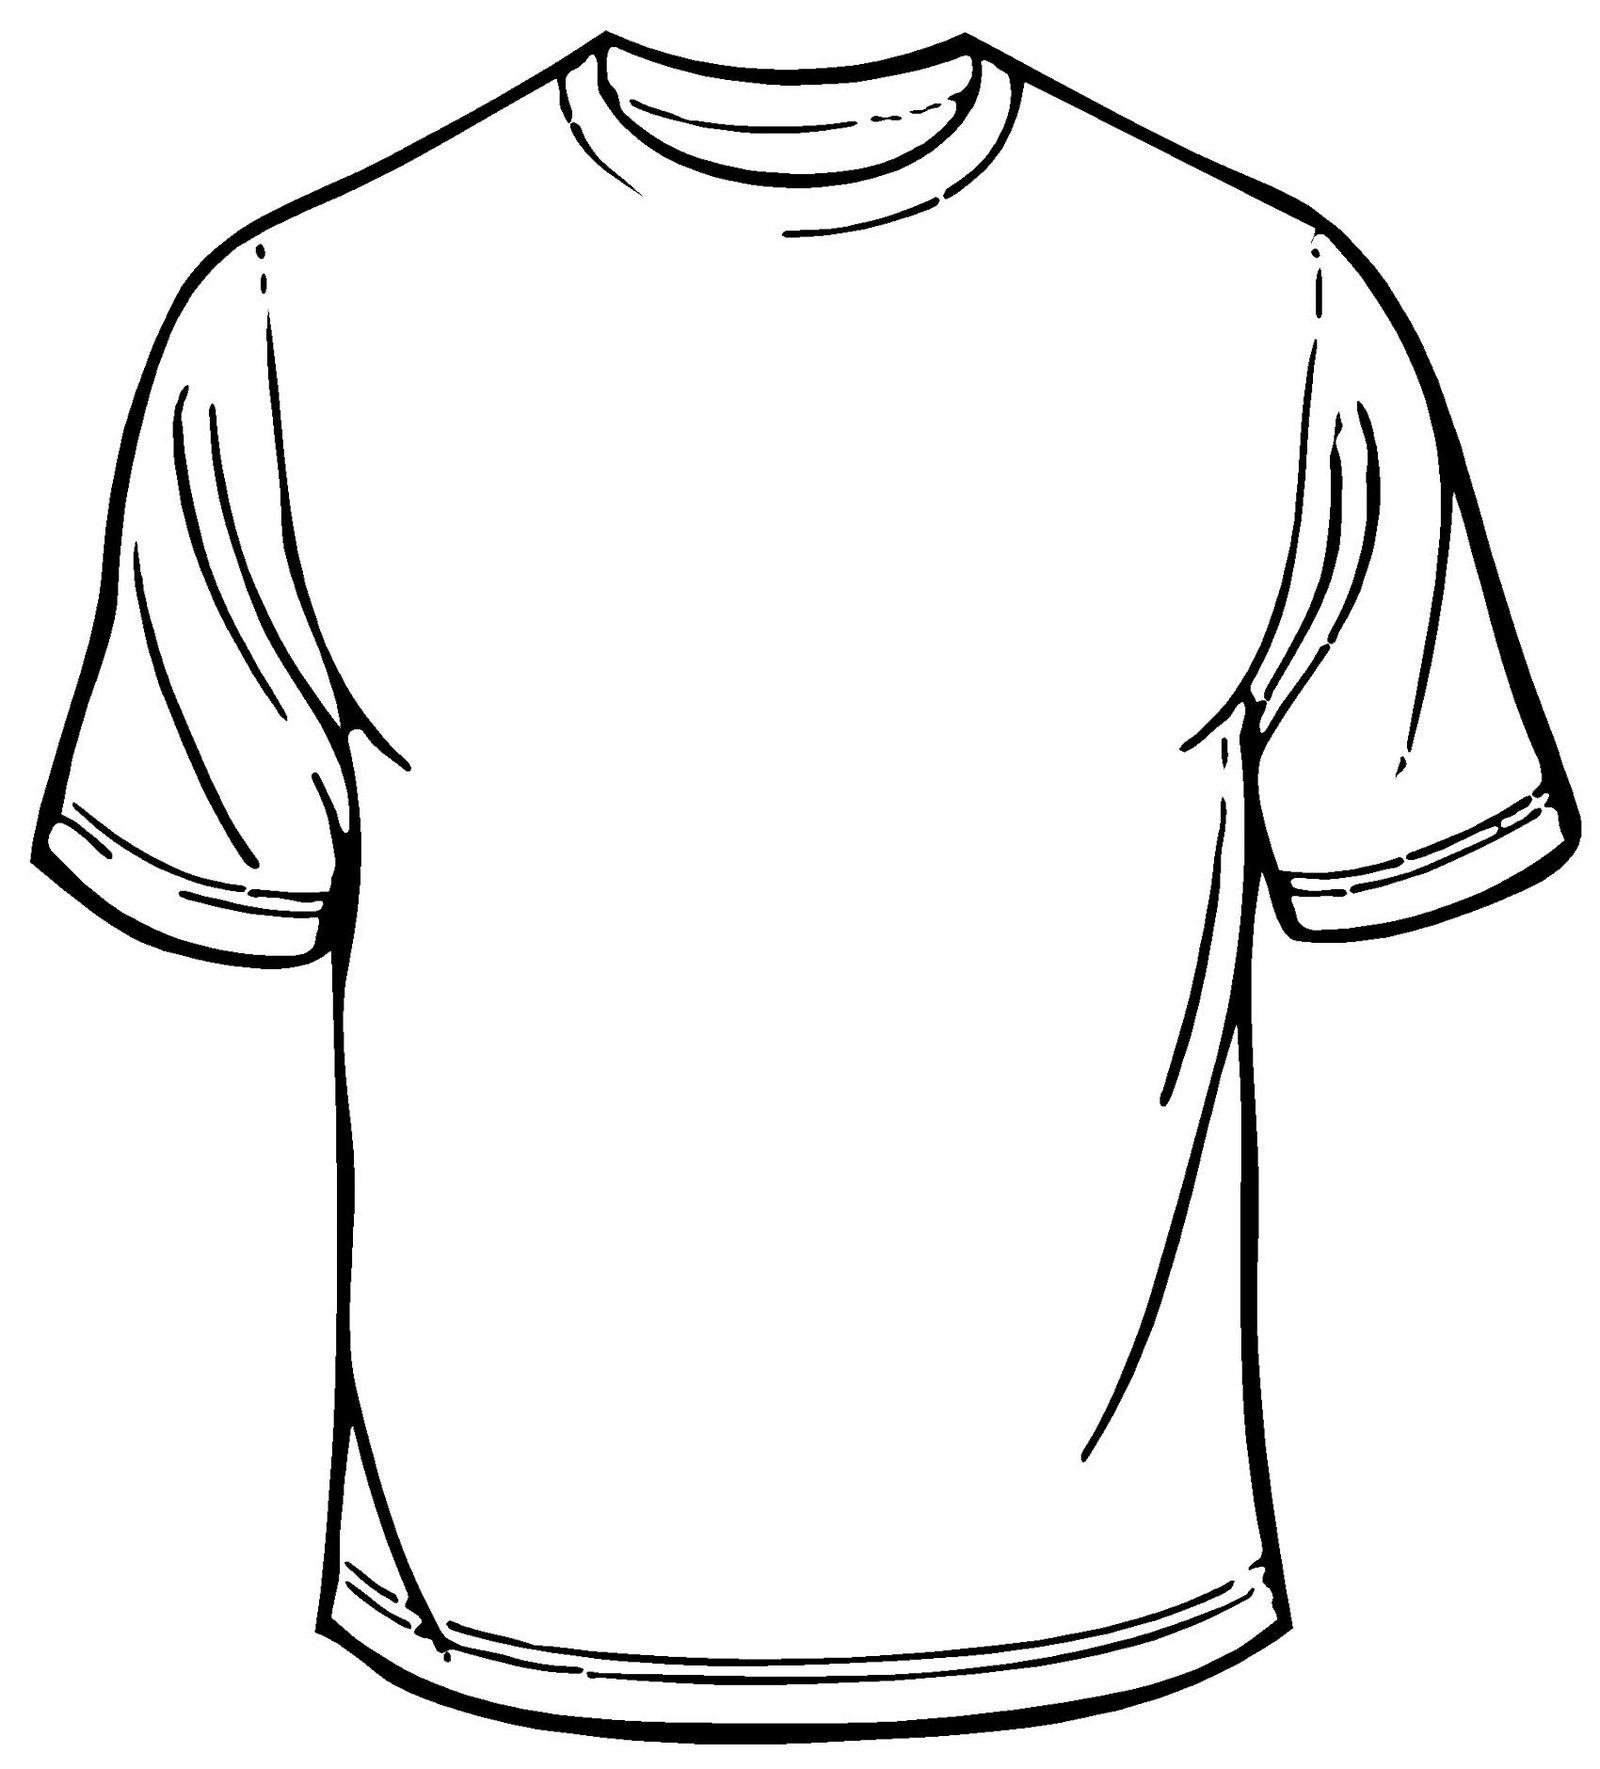 Blank T Shirt Coloring Sheet Printable